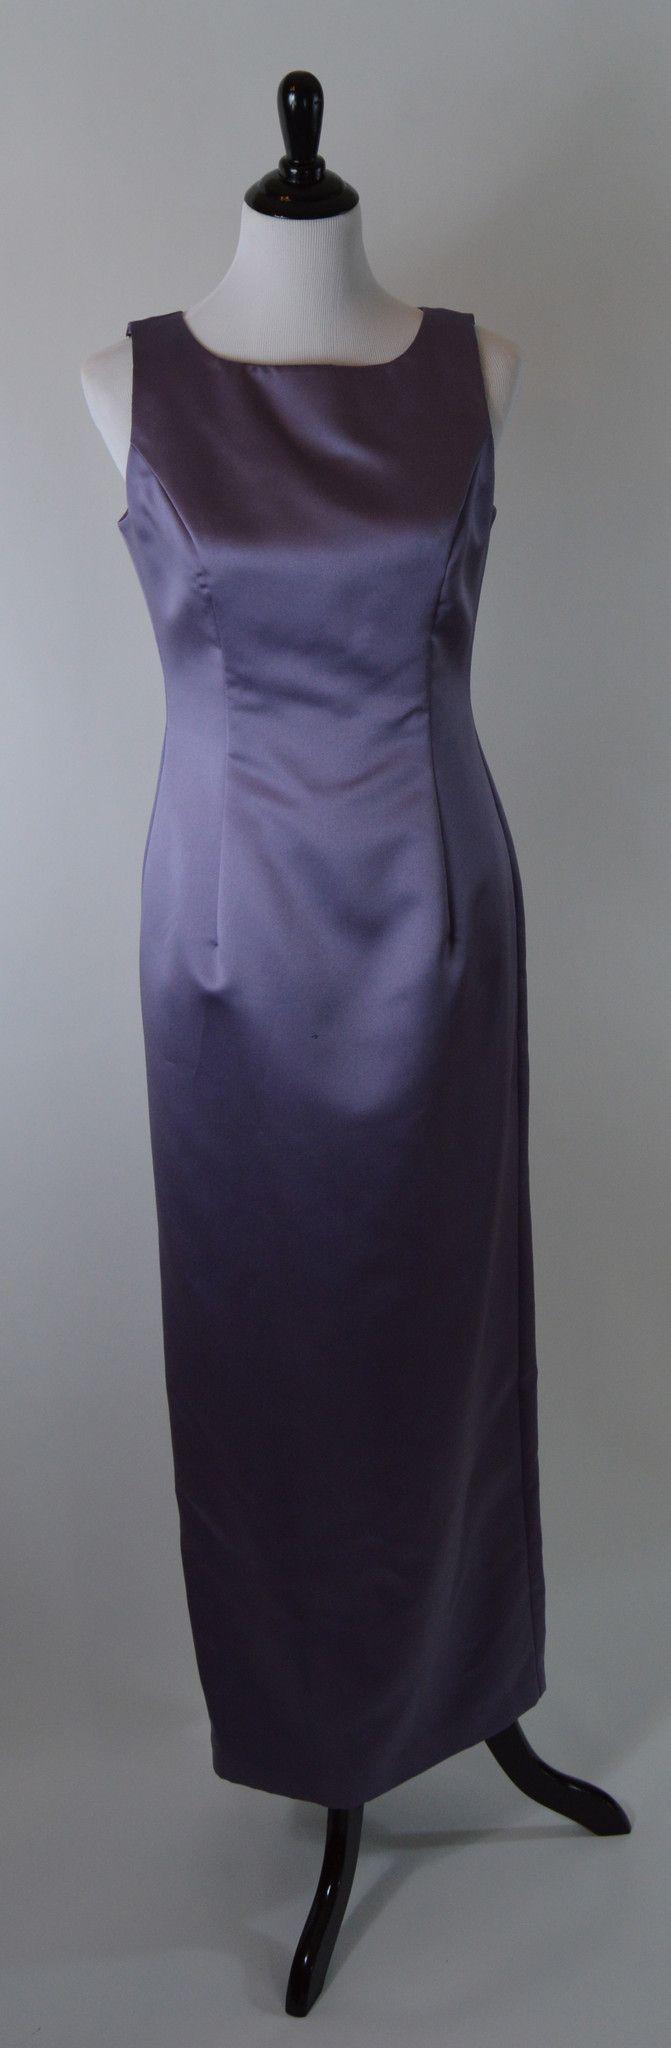 Michelangelo Formal Dresses Purple